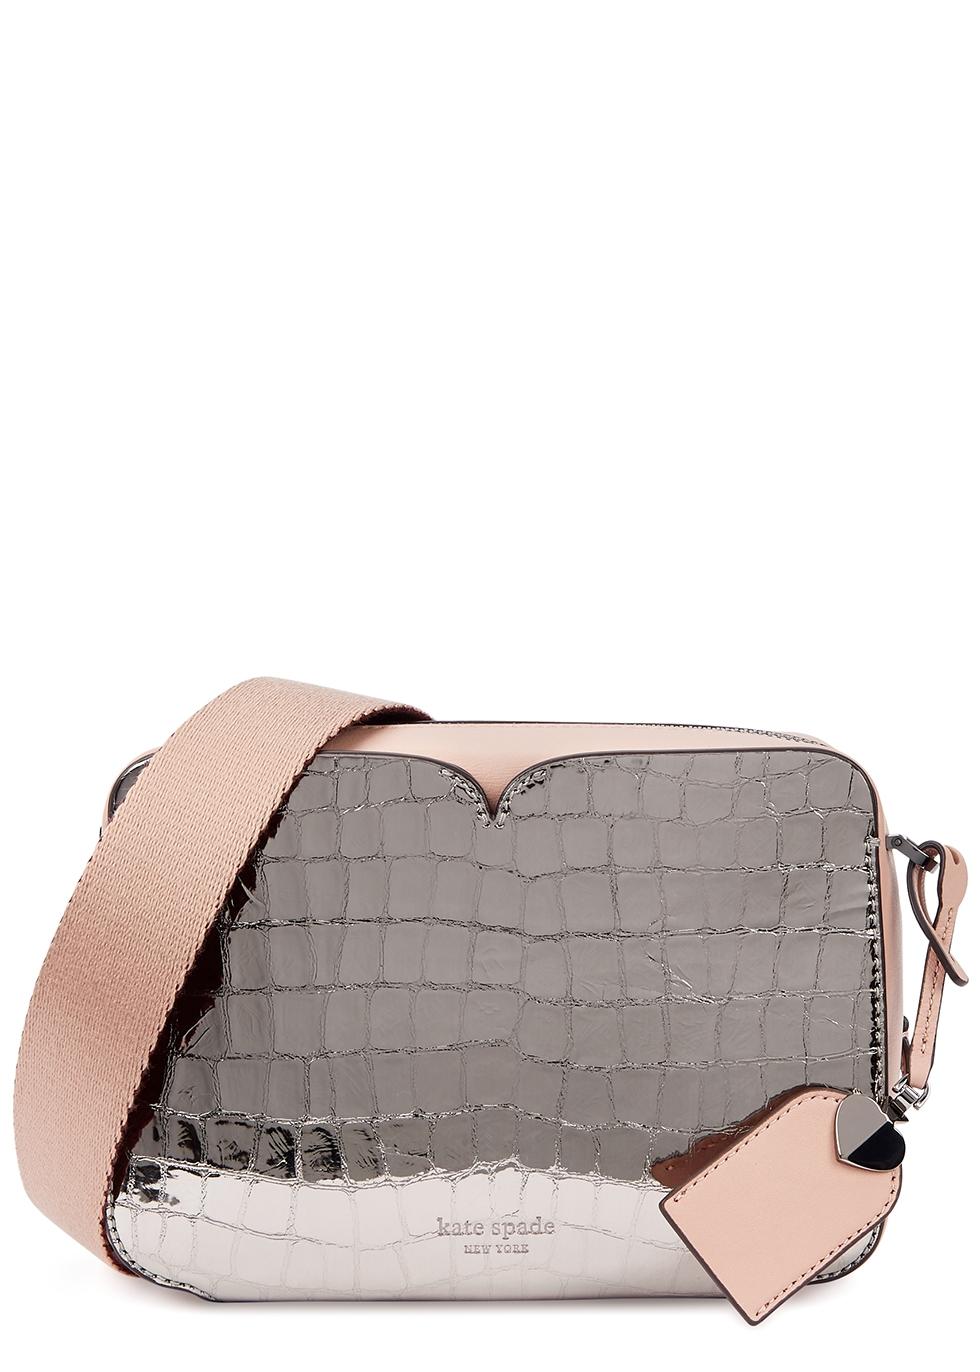 Candid medium leather cross-body bag